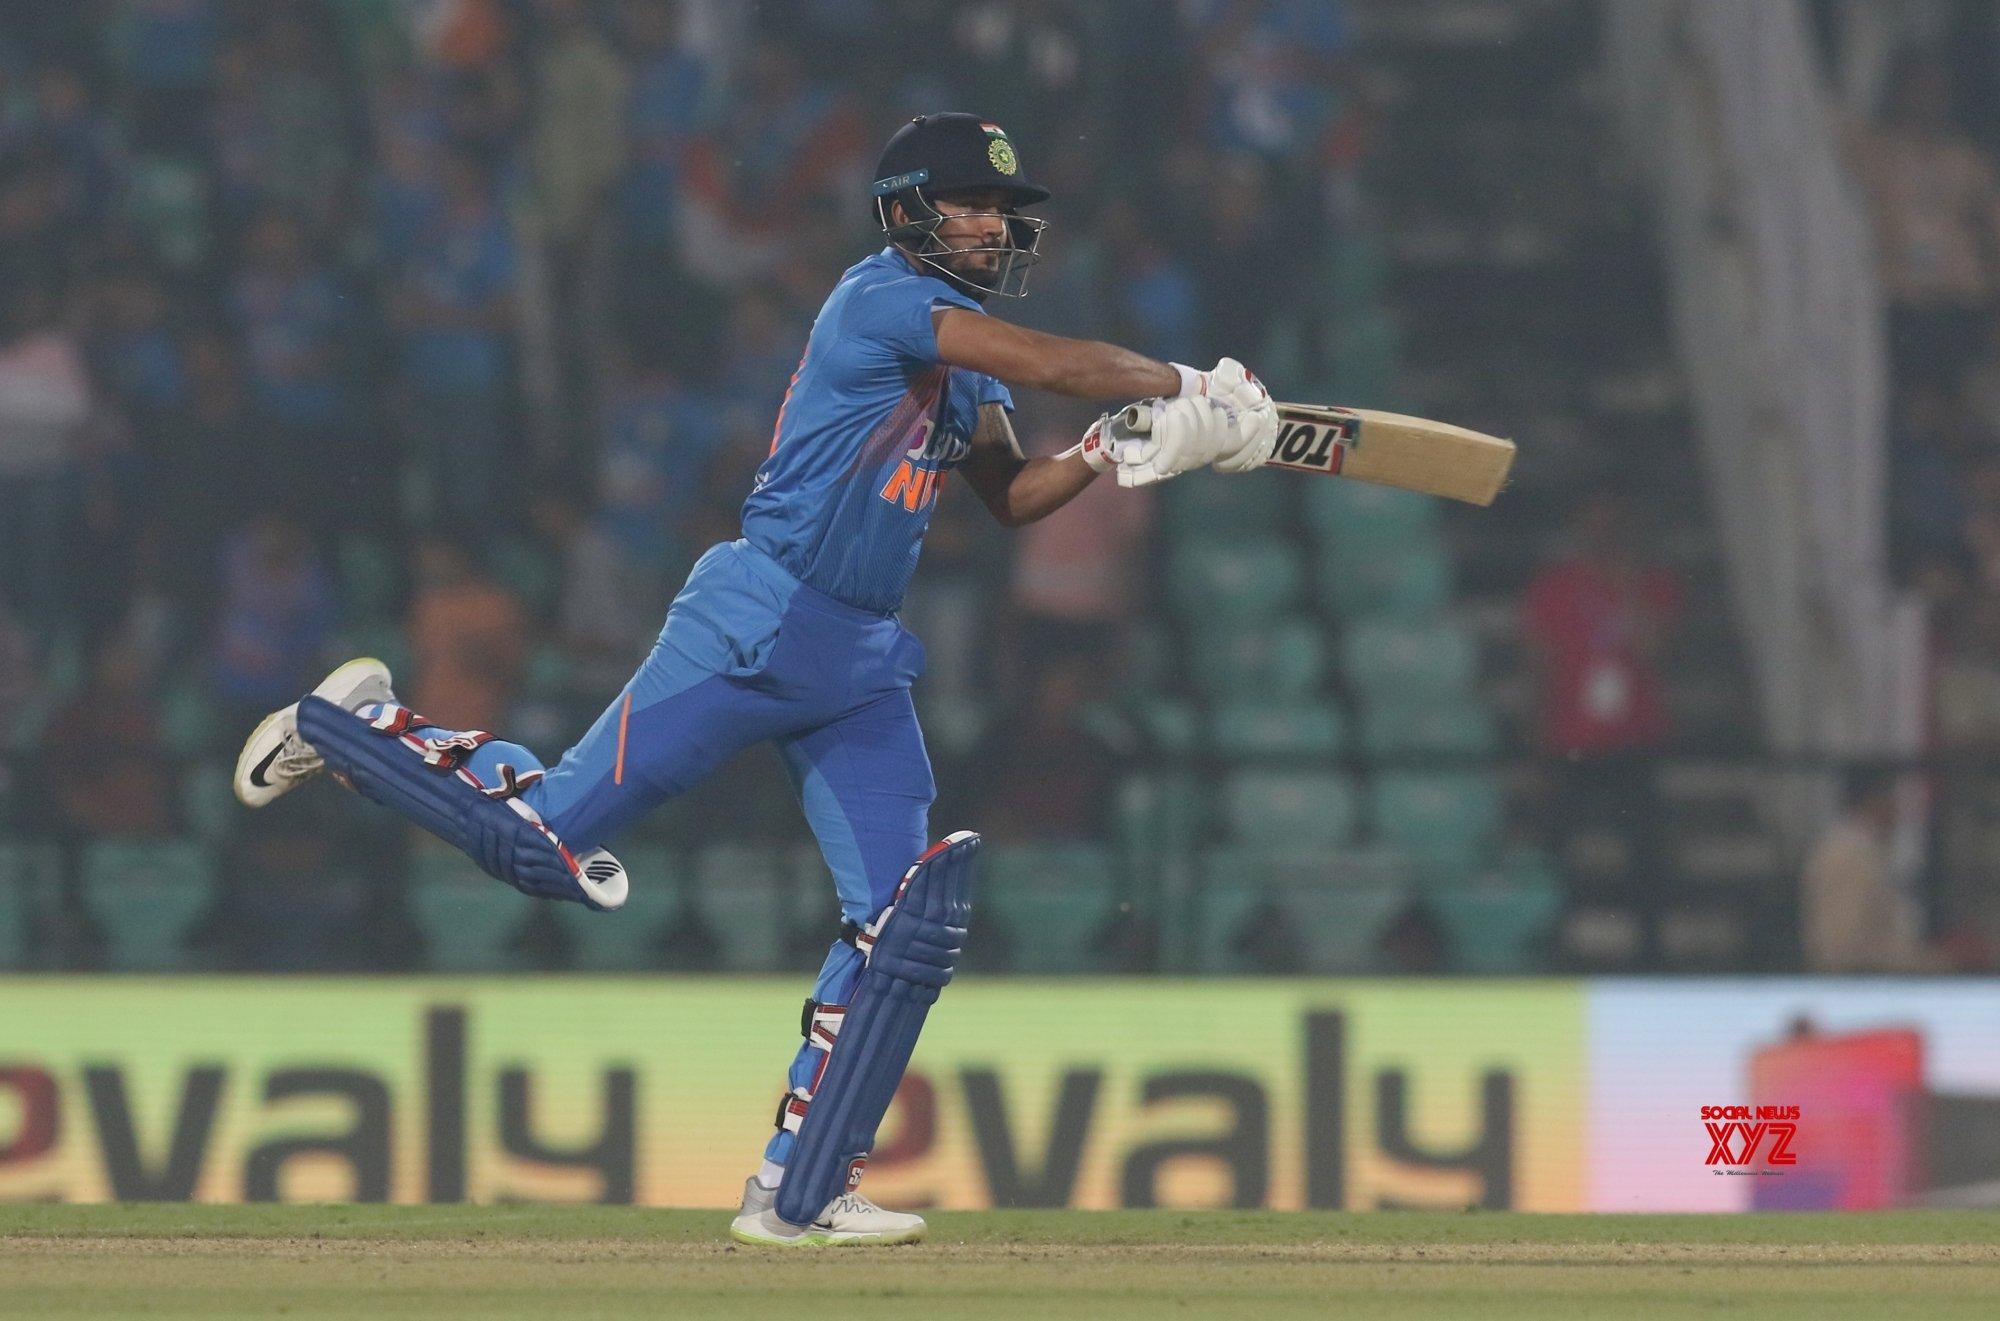 Nagpur: 3rd T20I - India Vs Bangladesh (Batch - 13) #Gallery